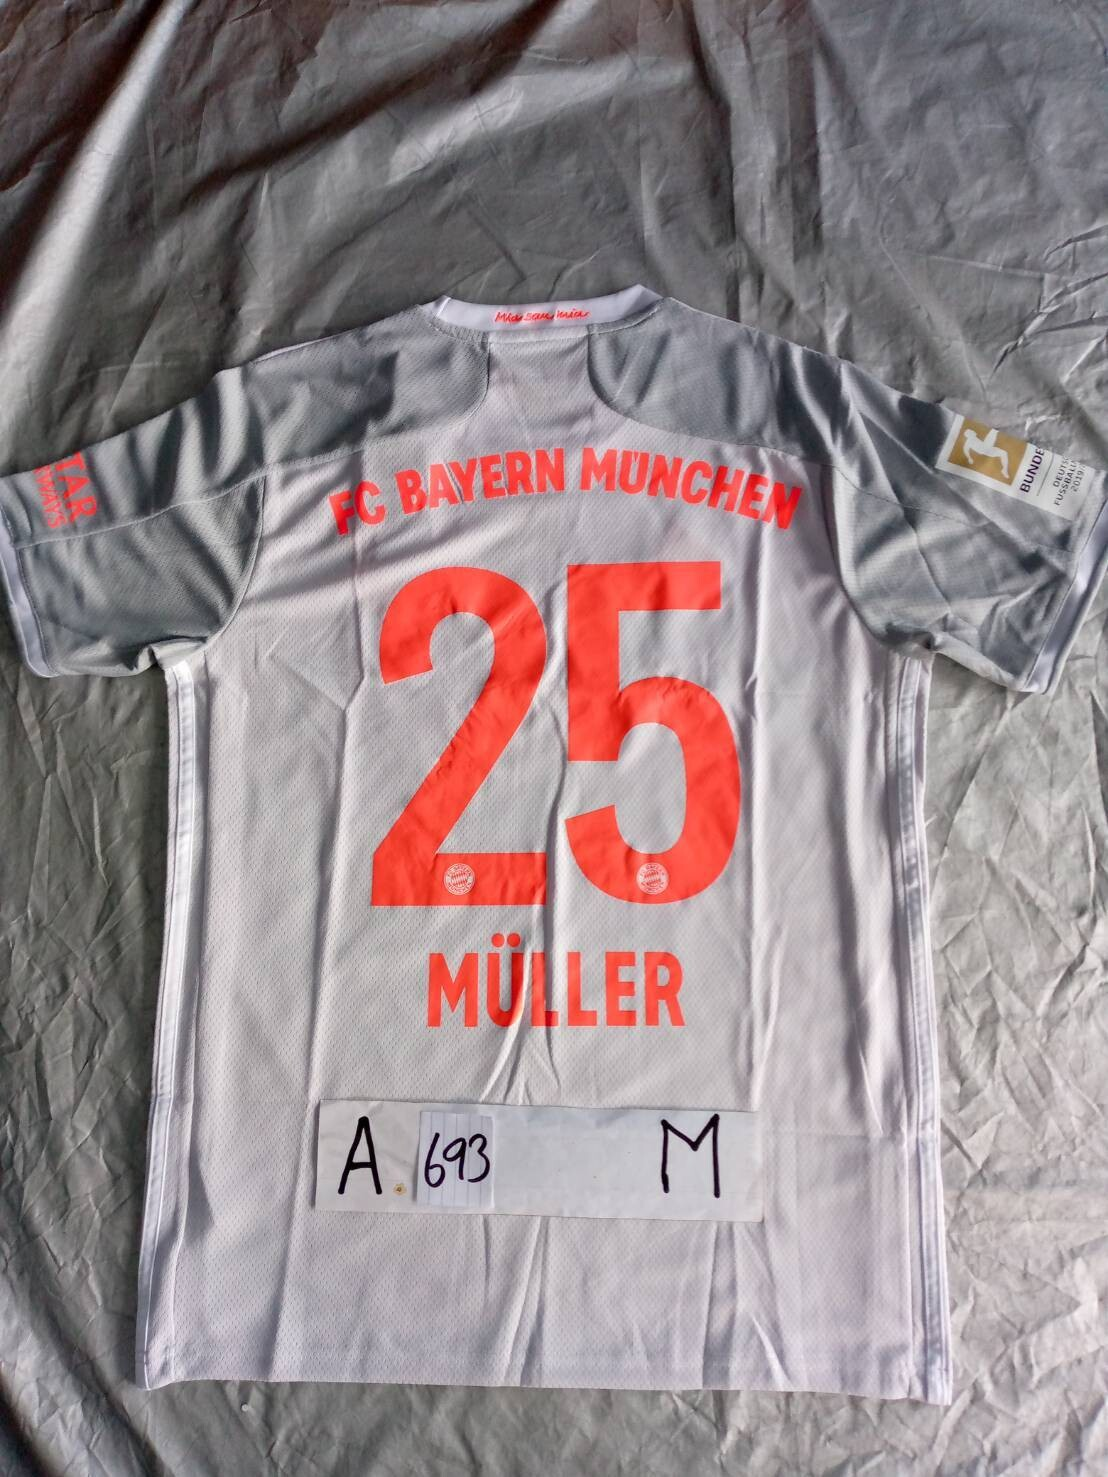 693  BAYER MUNICH BAYER MONACO MULLER 25 TAGLIA  M SIZE M